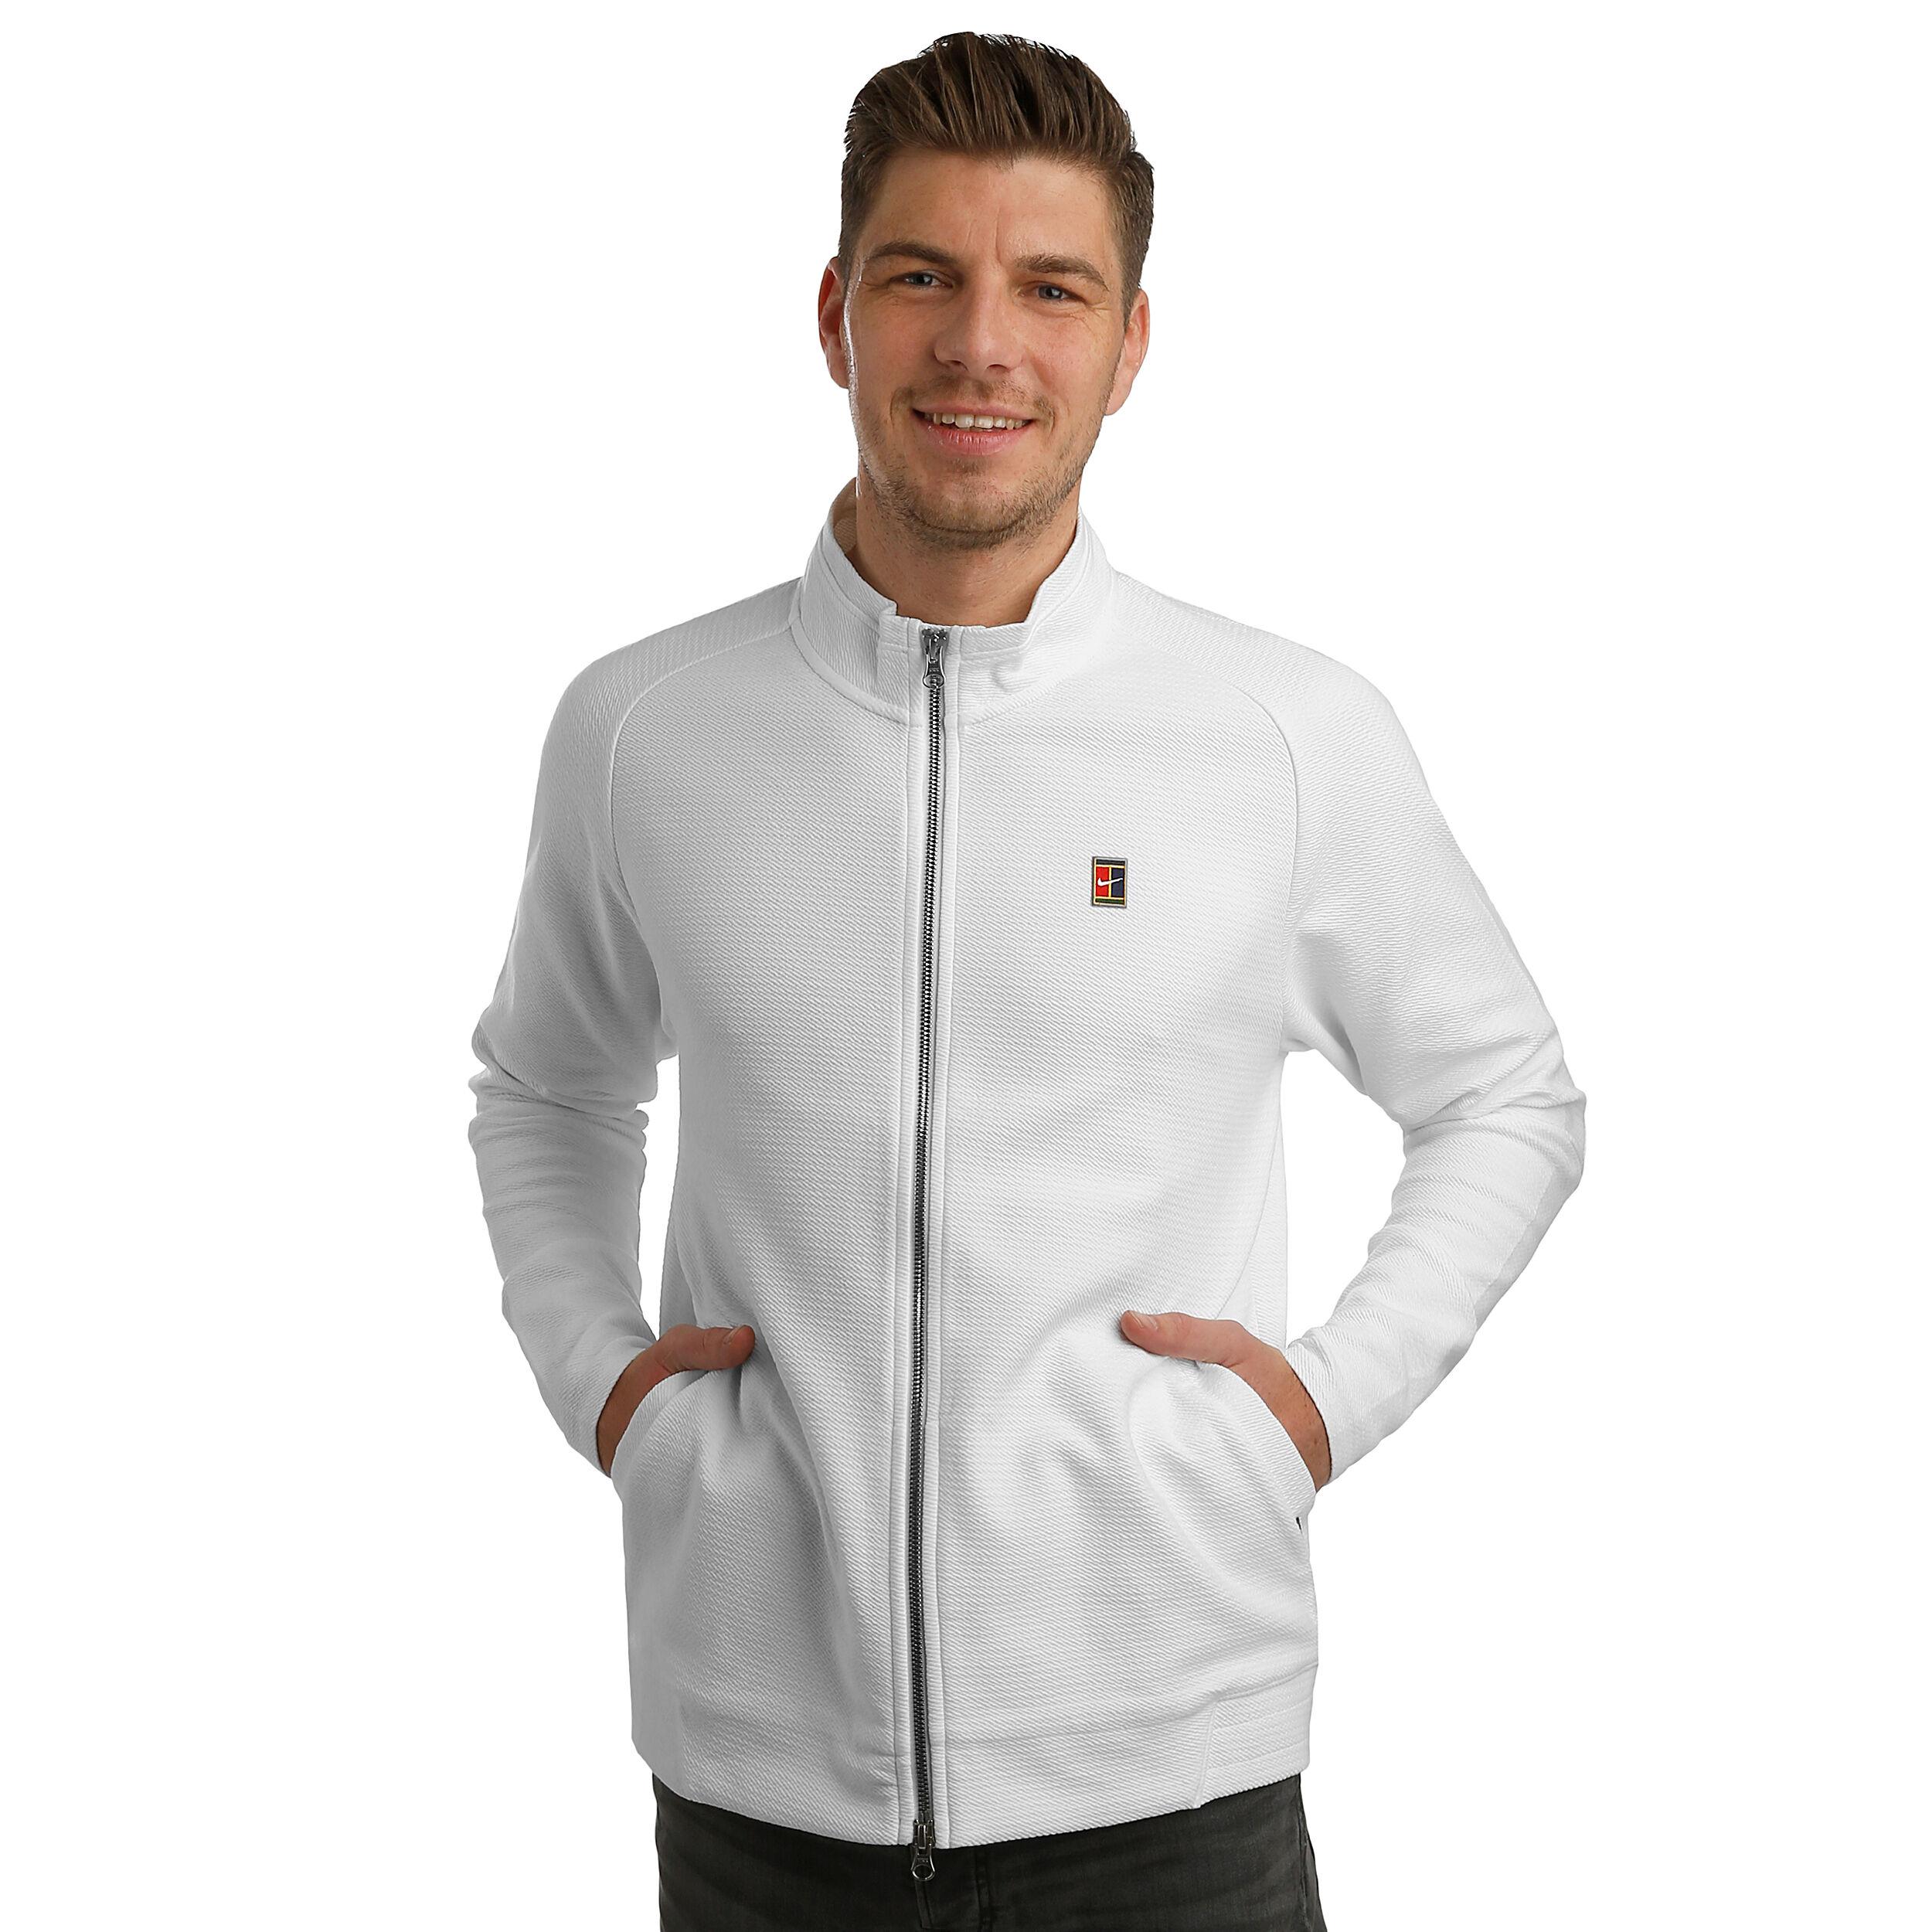 Veste Nike Court Heritage Veste Hommes Vêtements